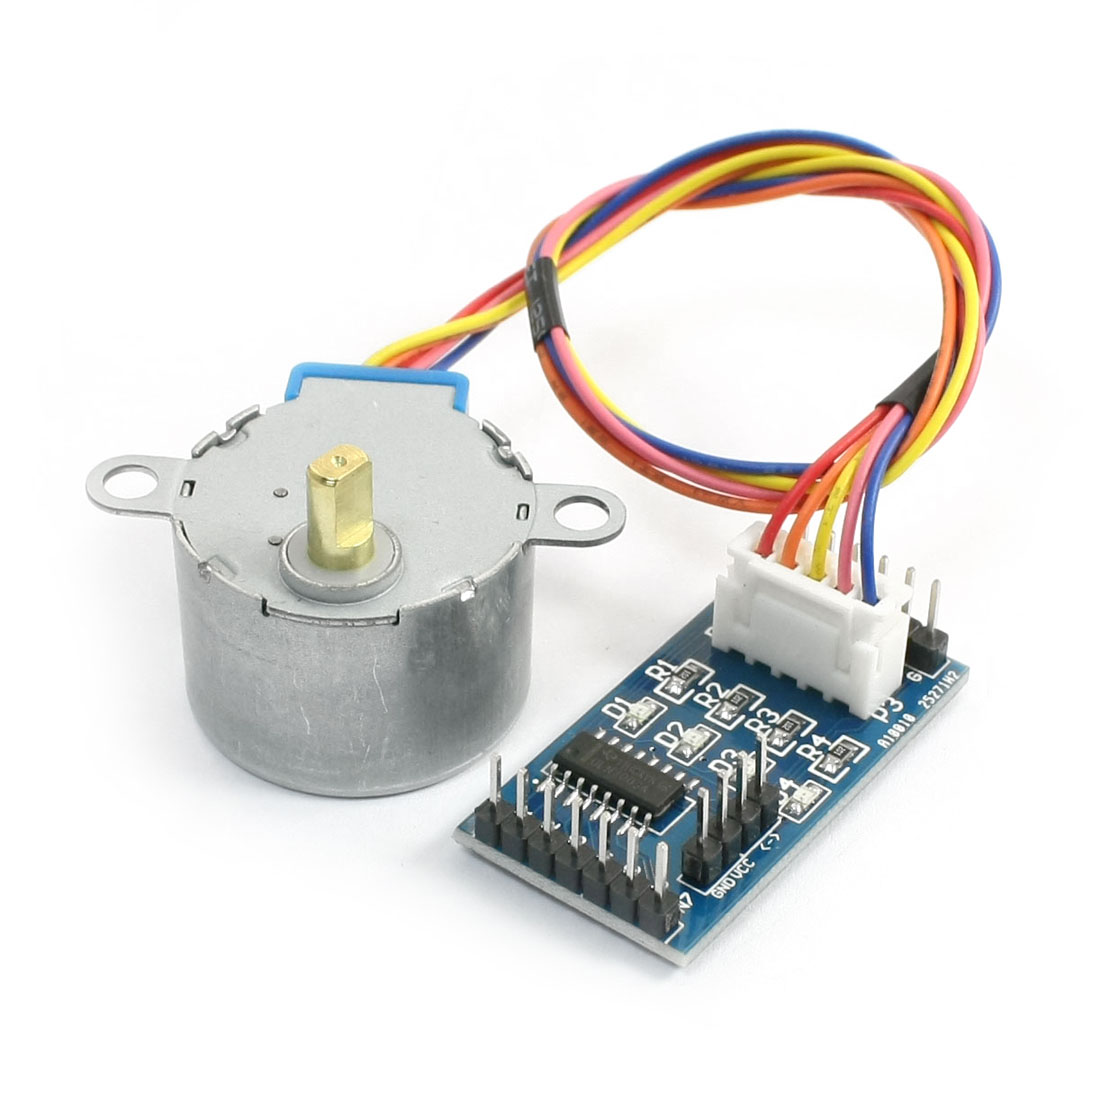 ULN2003 5V 4 Phase 5 Wire Stepper Motor Control Driver Board